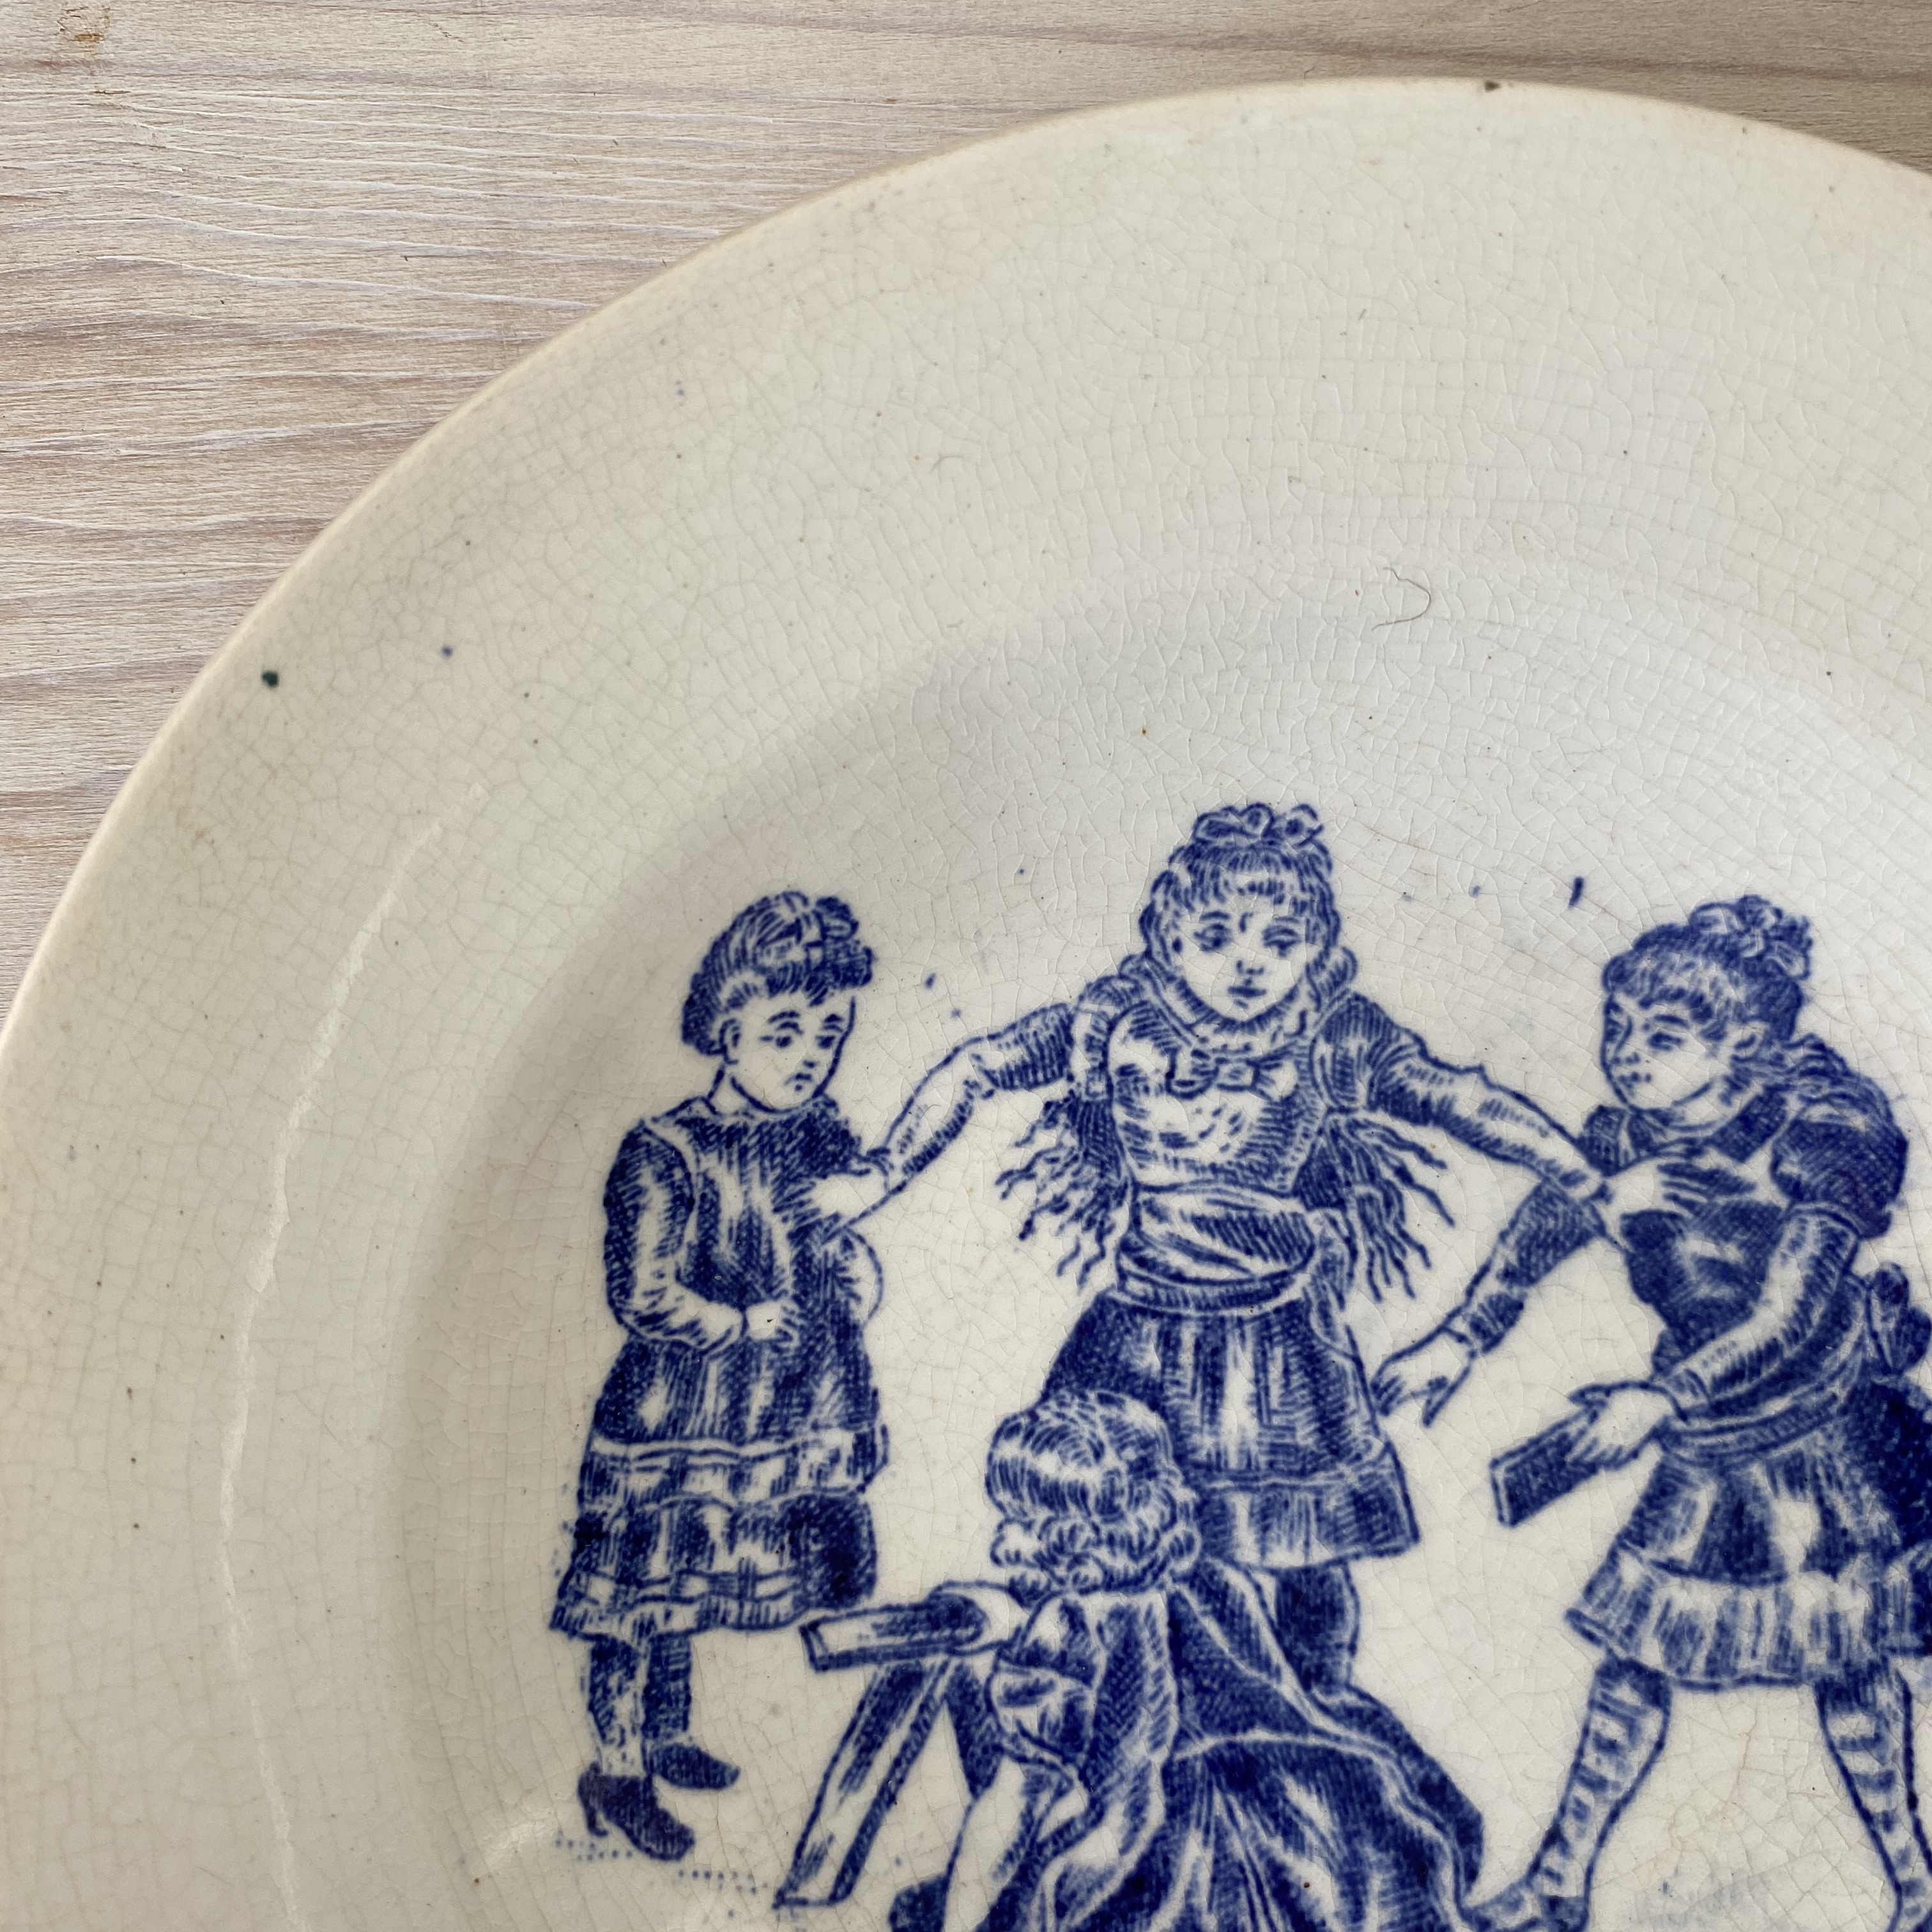 France ままごと・子供柄スーププレート(積木遊び) / aa0063